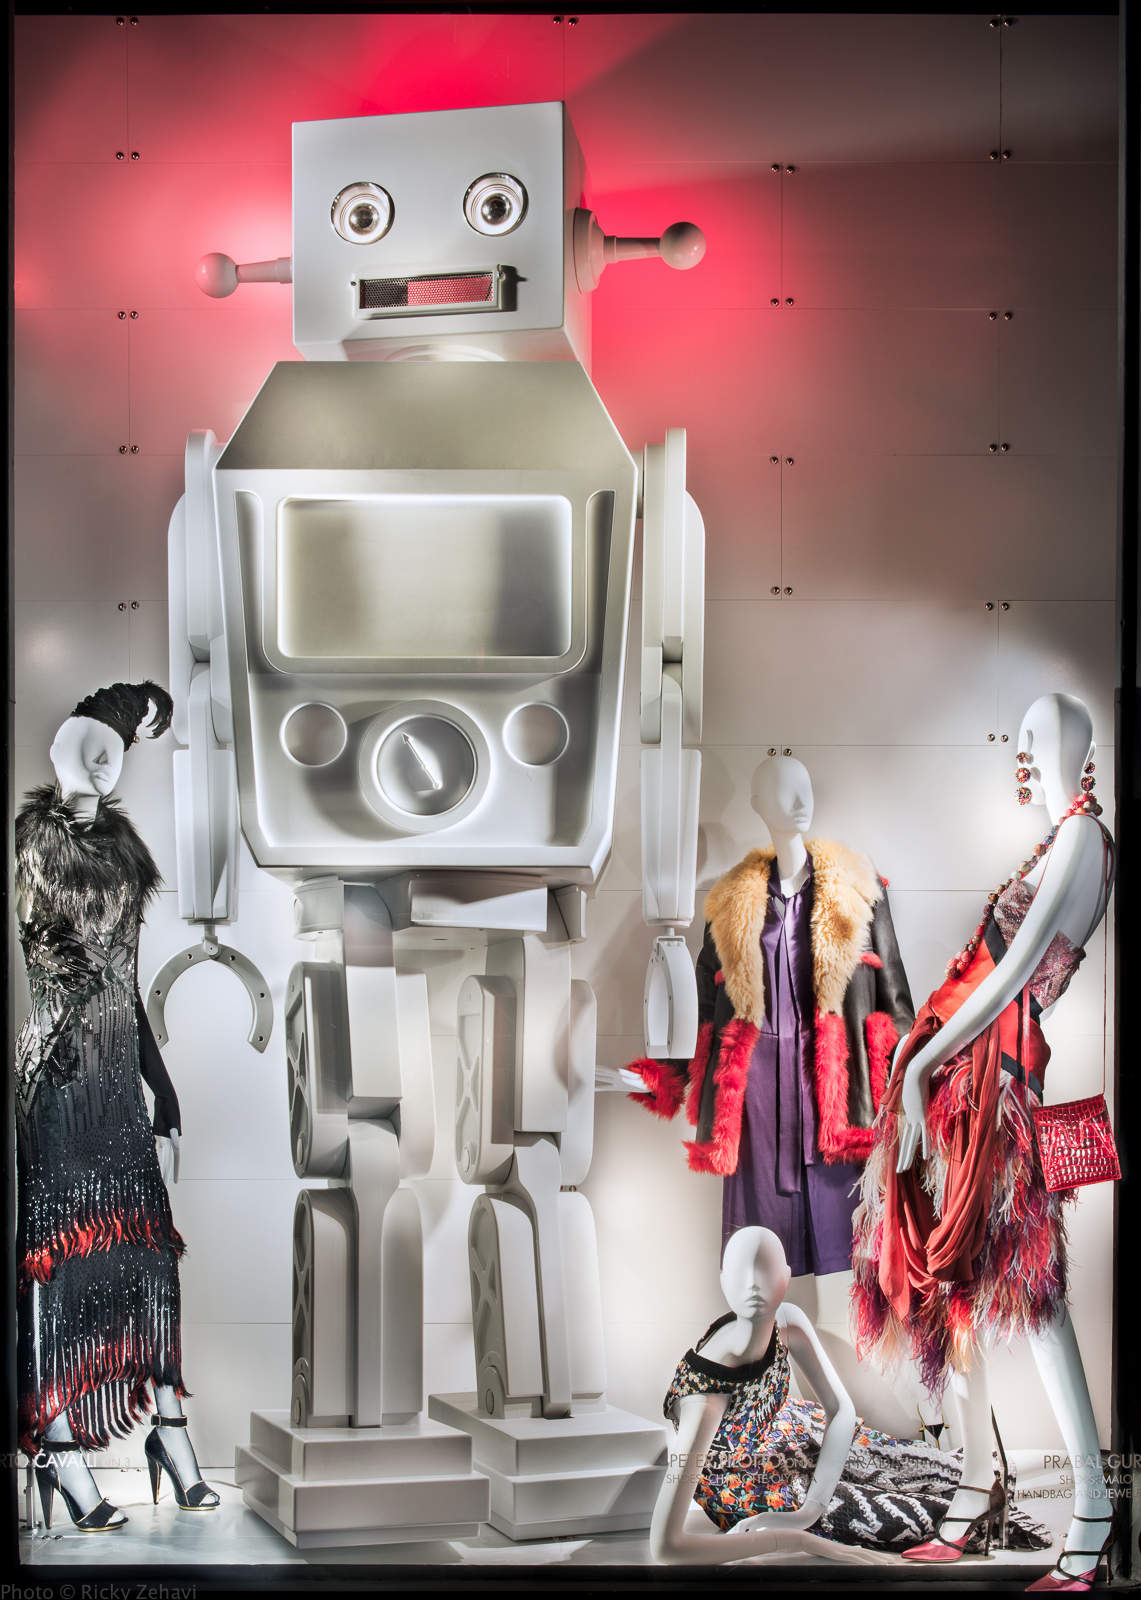 001_Rzehavi_BG_robots_9_1_2014-1.jpg